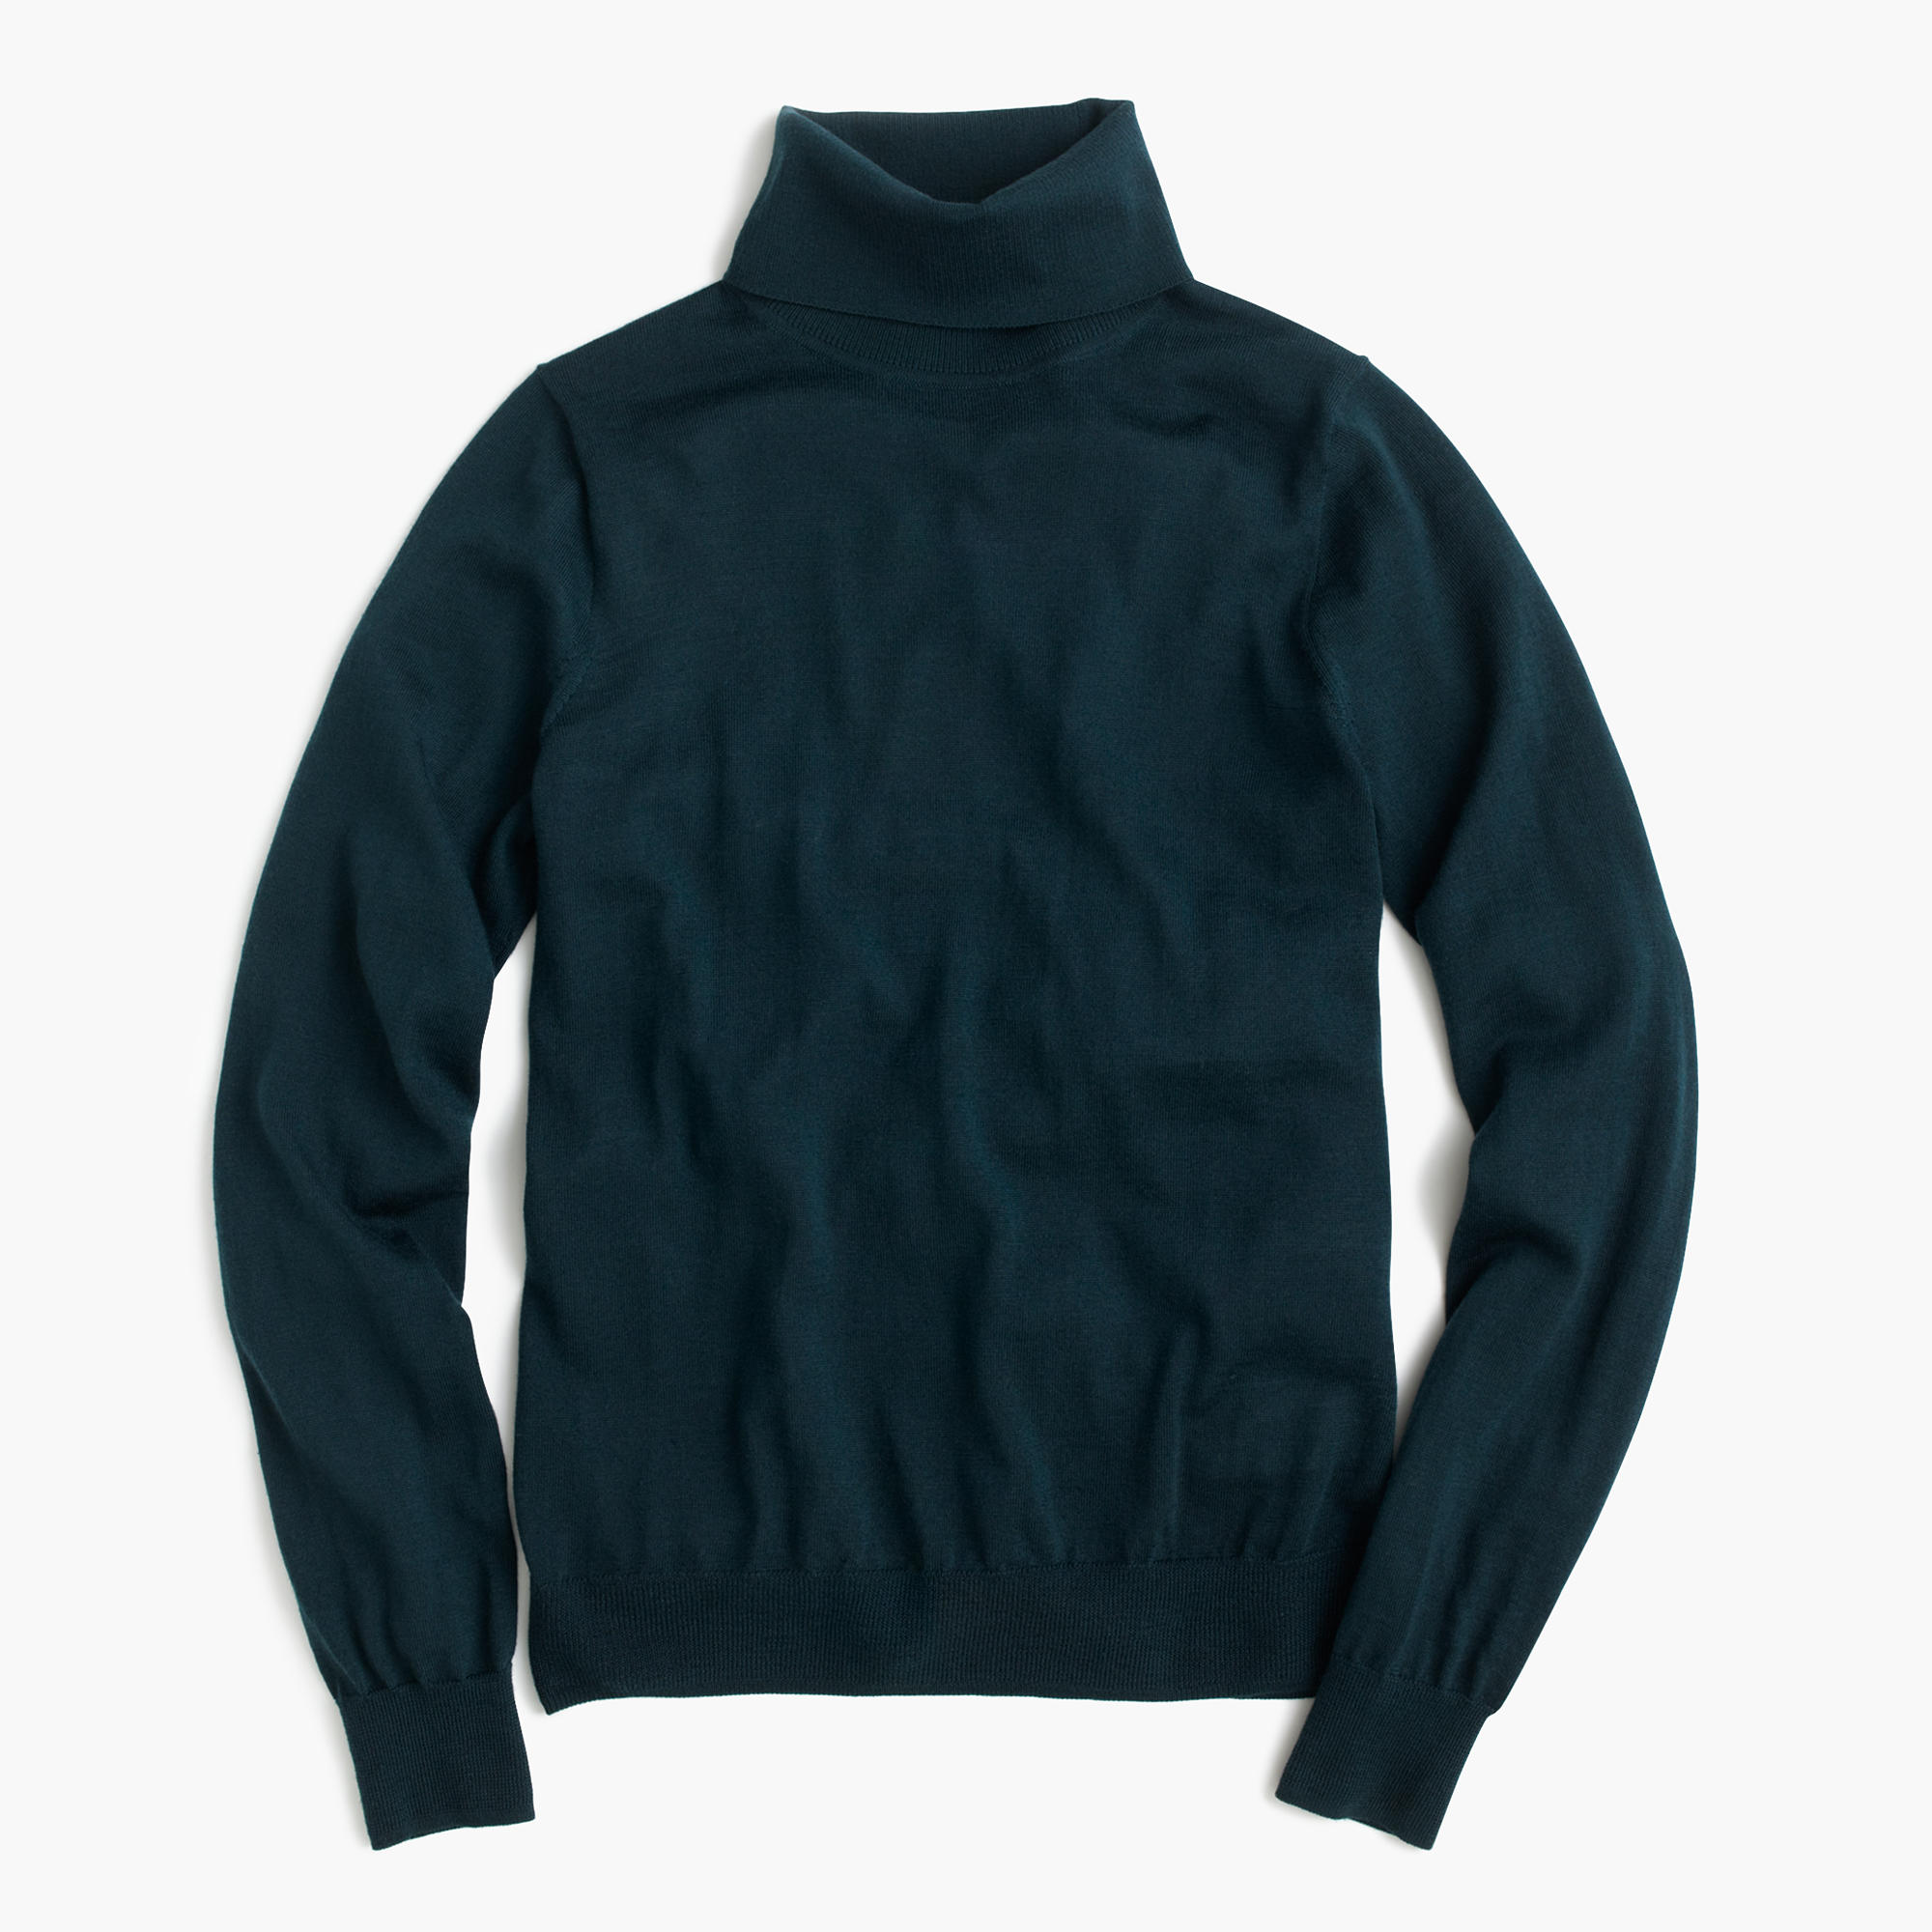 "J.Crew ""Tippi"" sweater, $79.50; jcrew.com."